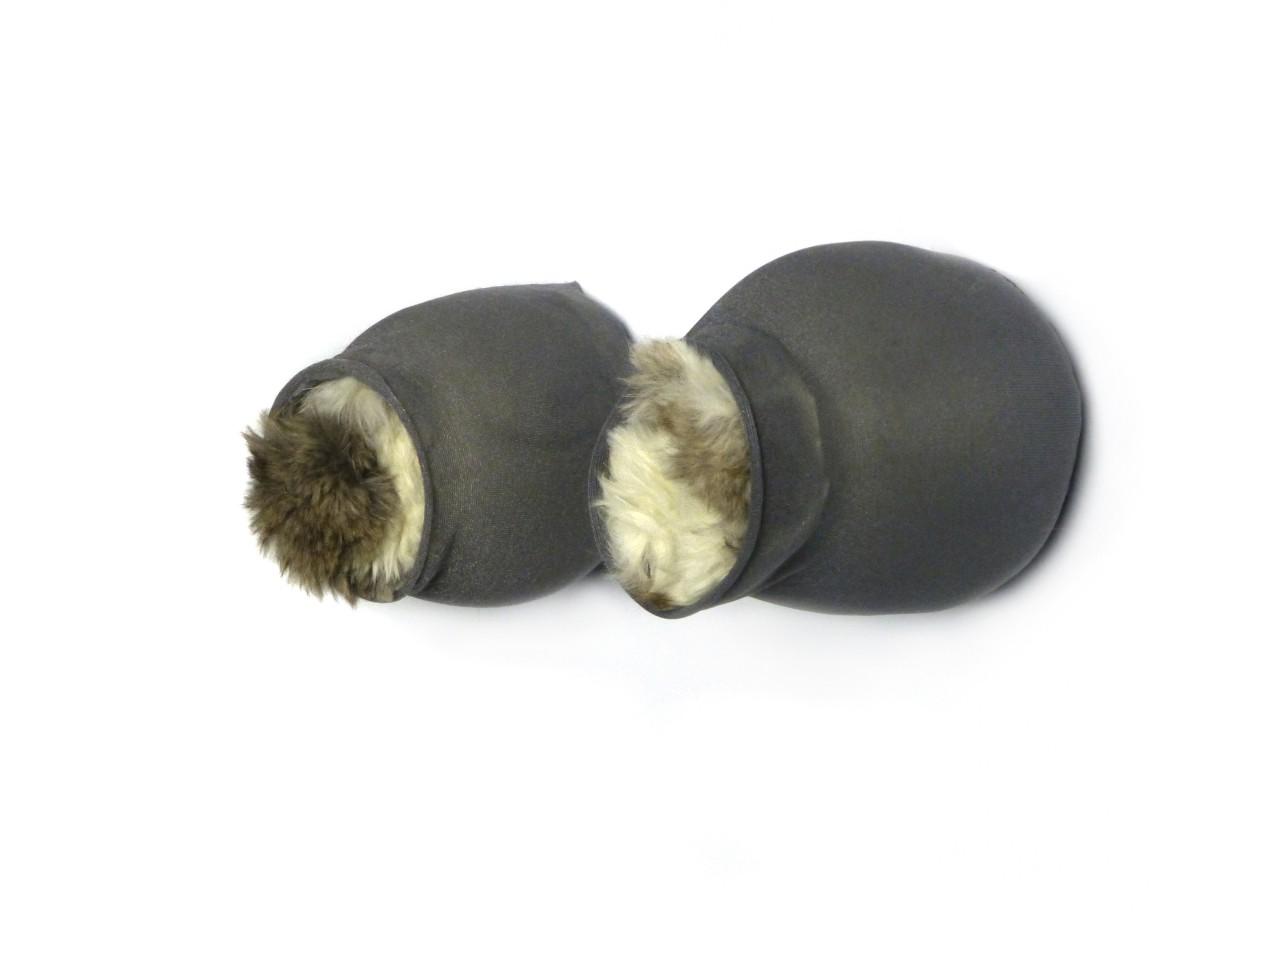 Gretchen in der Stube Teil 1, Nr.2, Nylons, sheep`s wool, rabbit fur, needled, 8x14x10 cm